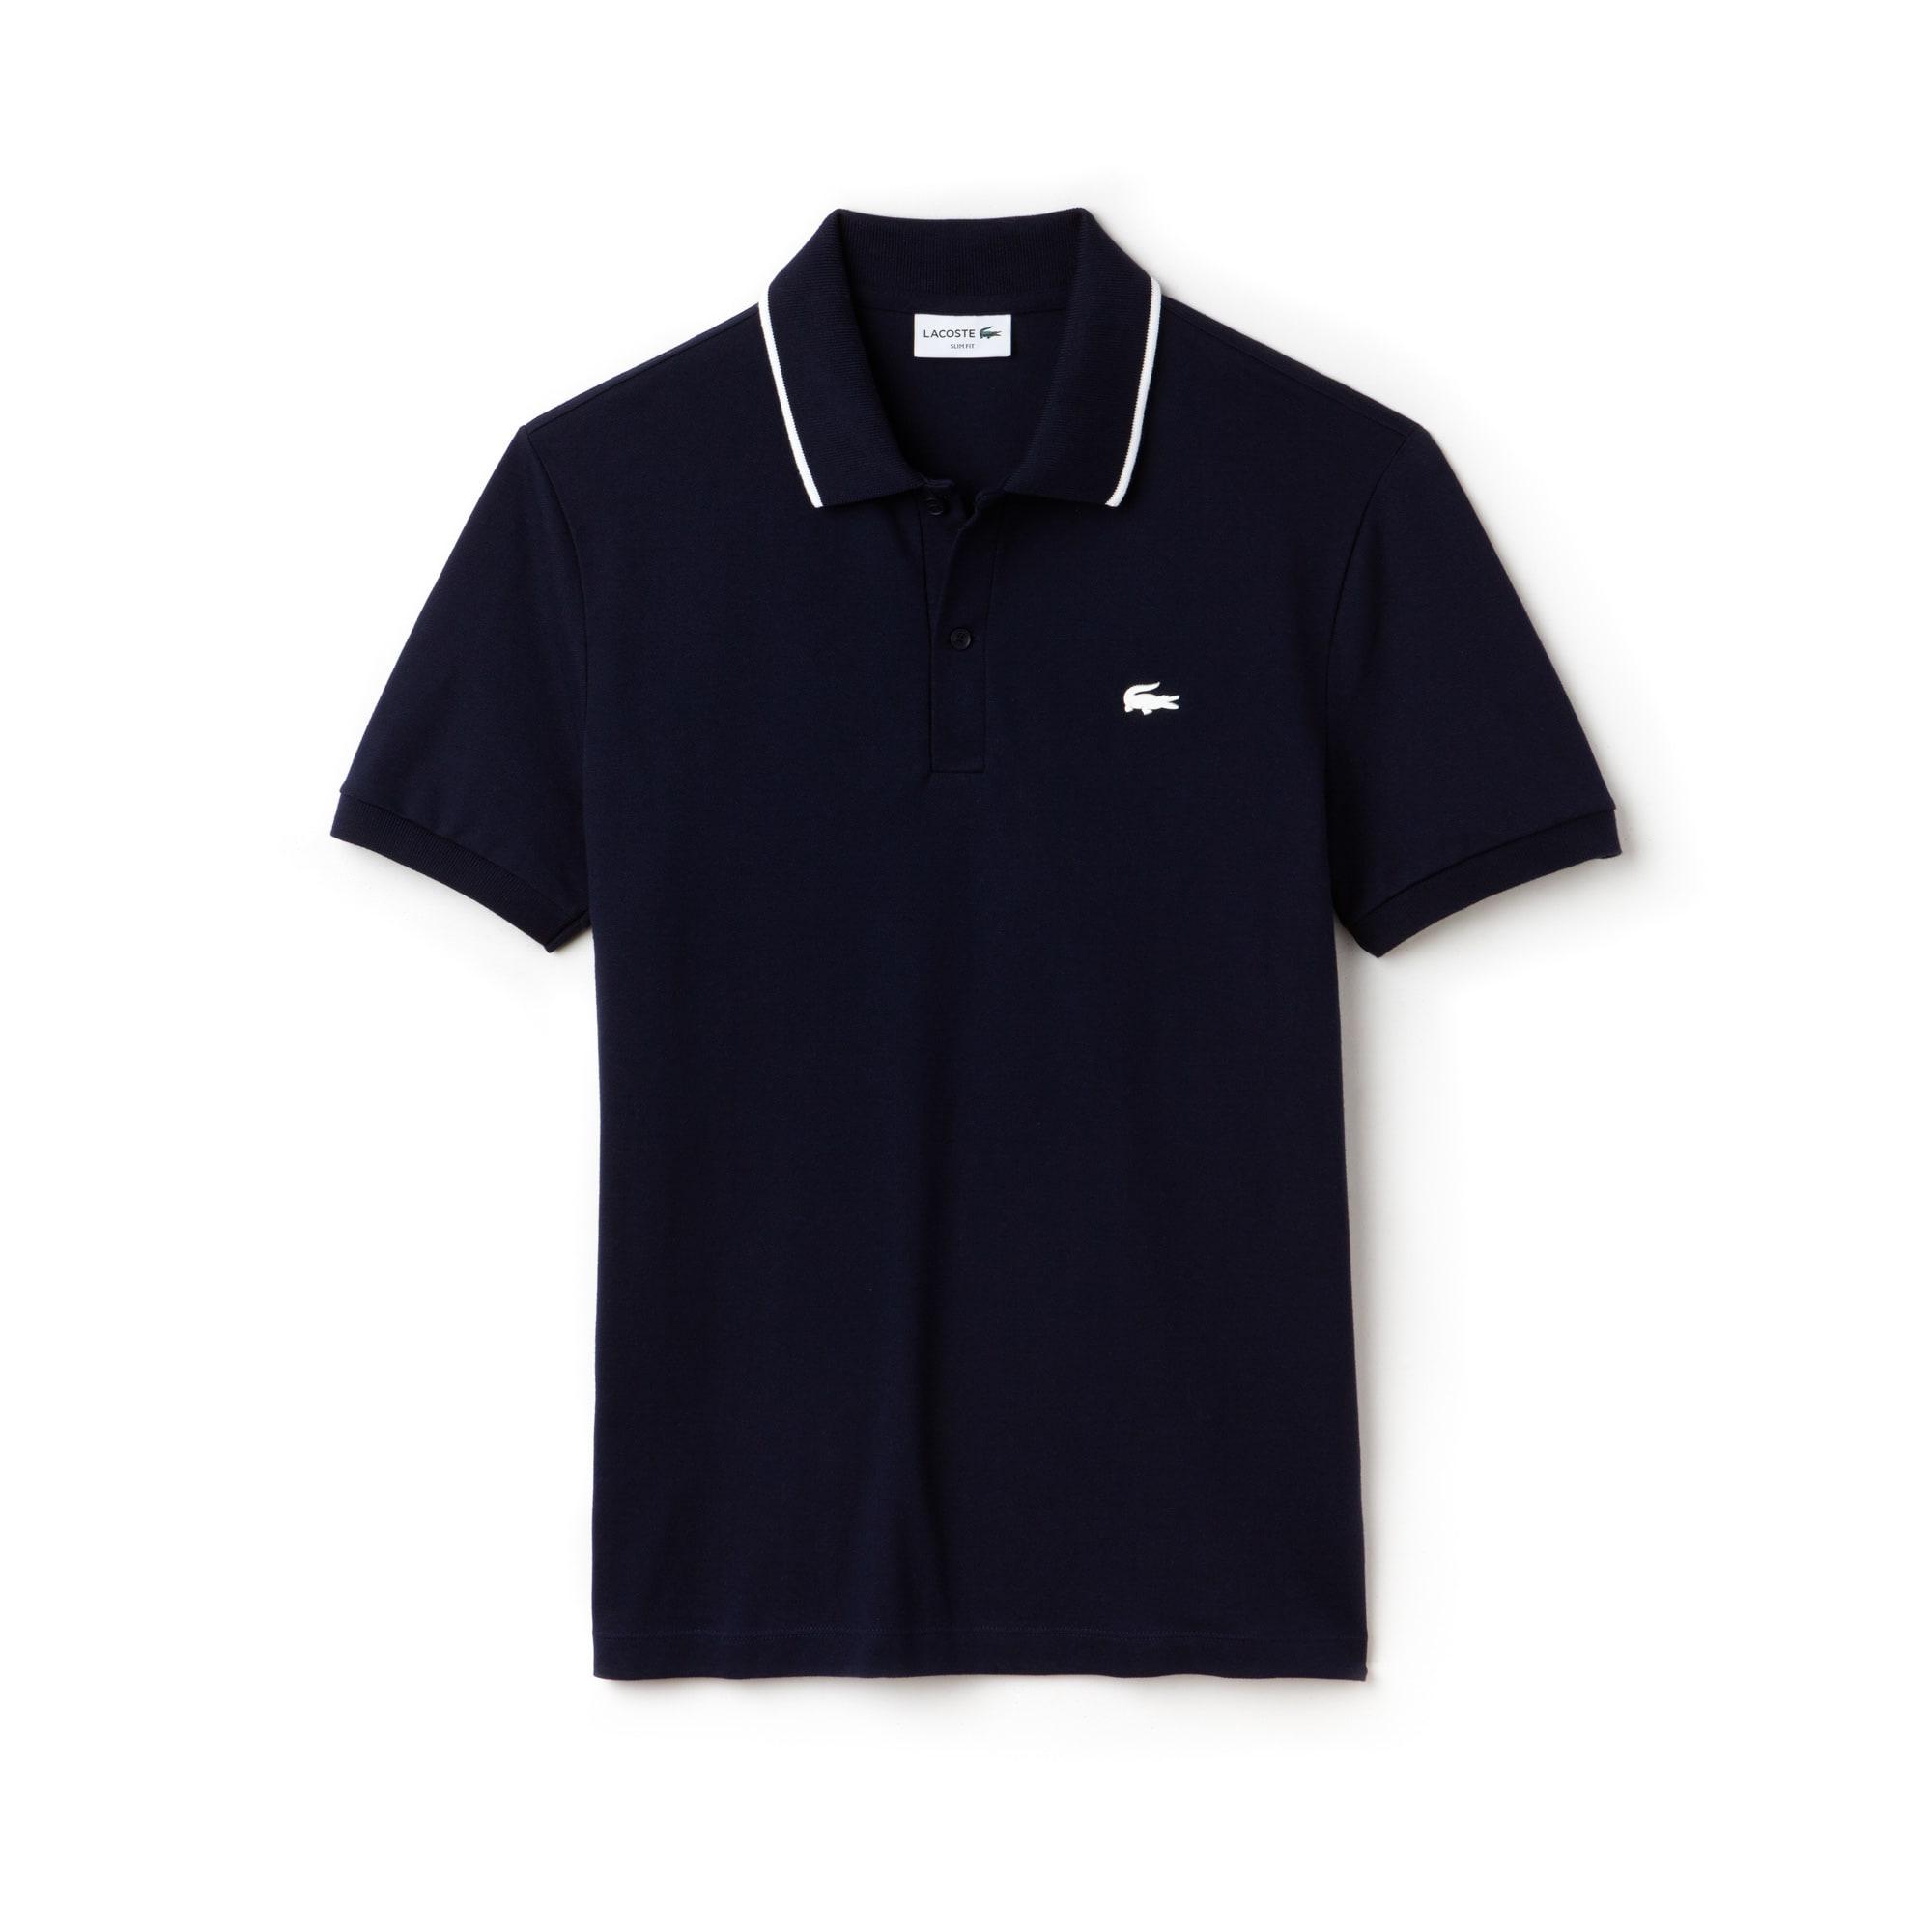 Polo slim fit Lacoste en coton pima stretch avec piping au col